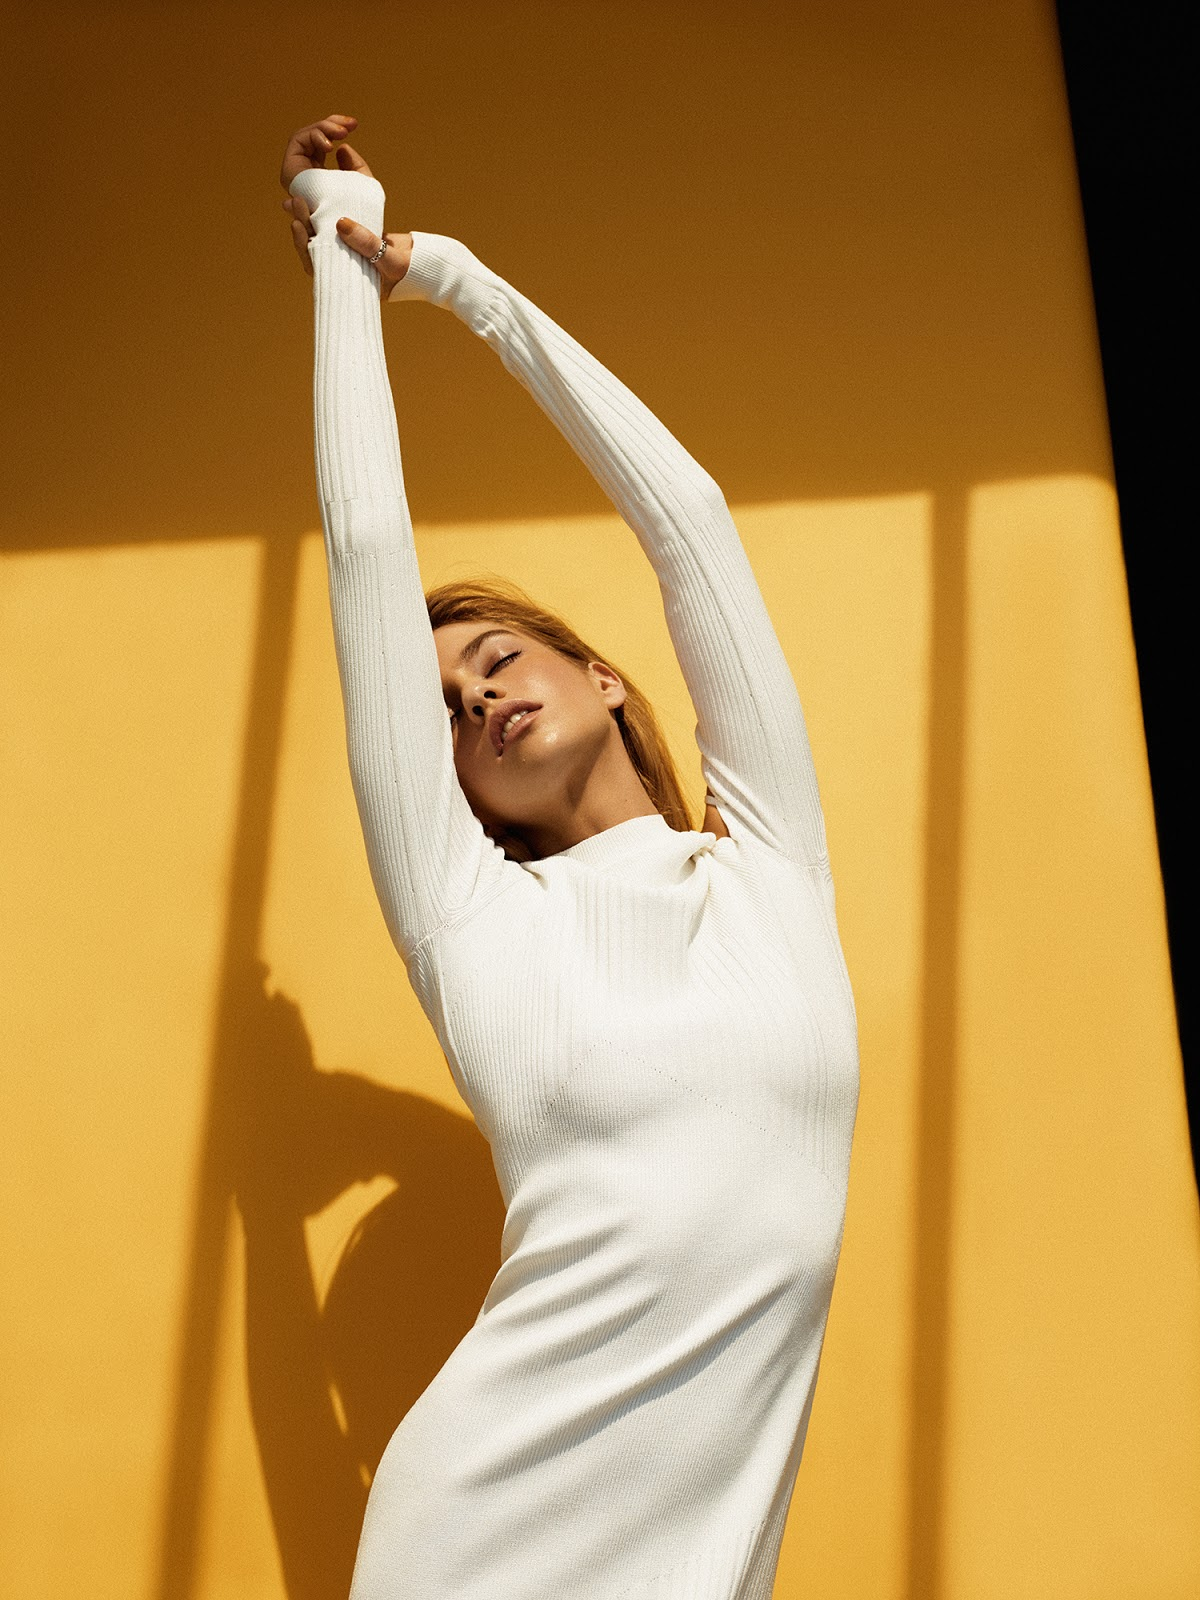 Stella Maxwell by Jason Hetherington for Grazia UK